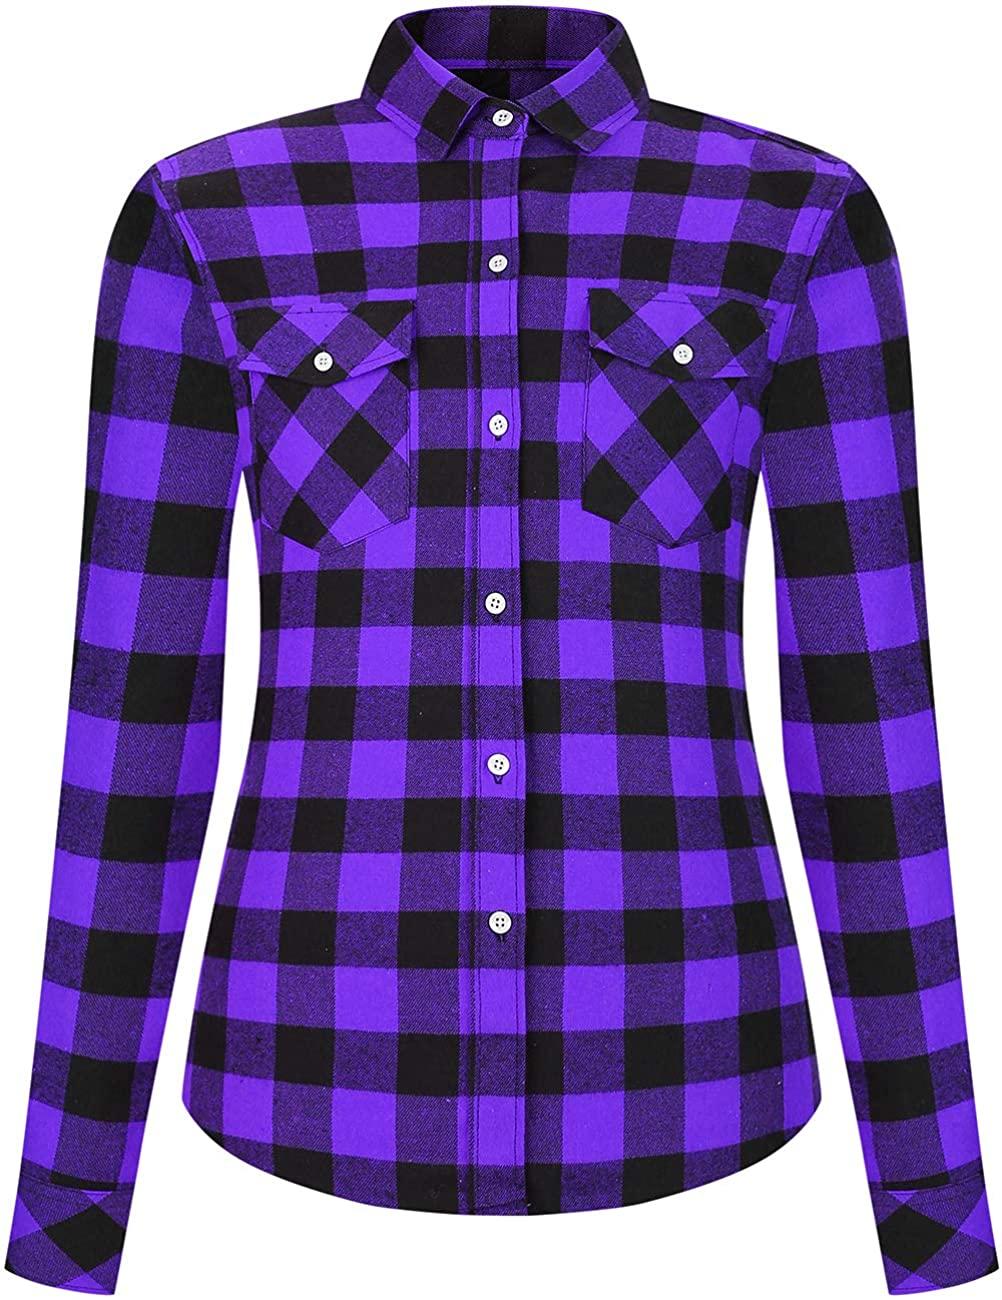 Leonal Women's Flannel Blouses Casual Long Sleeve Buffalo Plaid Work Dress Shirt Jacket Tops